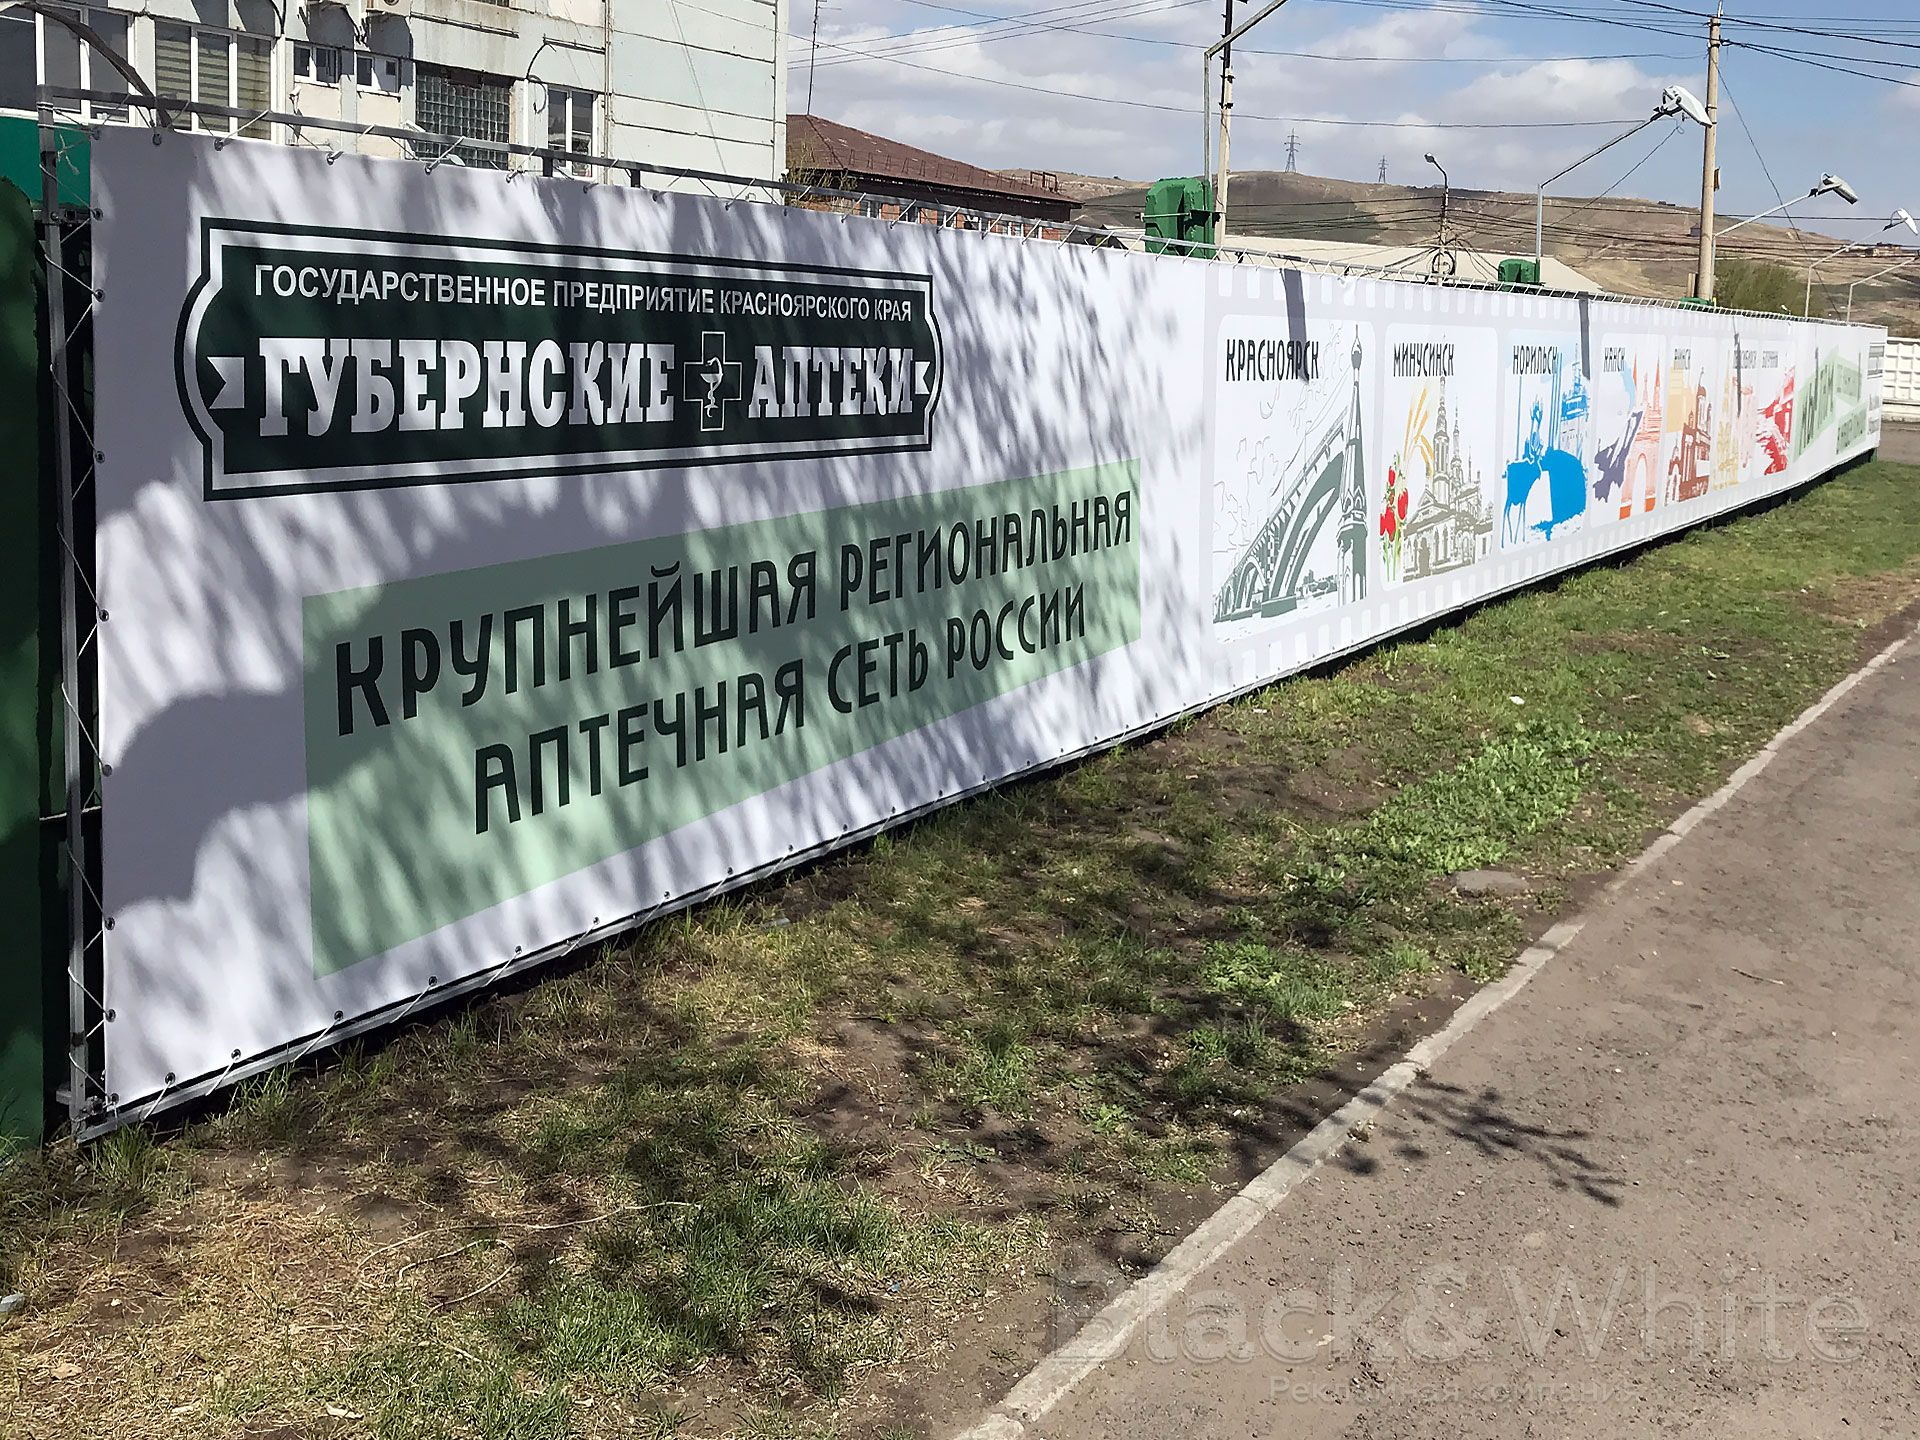 Печать-на-баннере-металлокаркас-в-Красноярске-Black&White...jpg